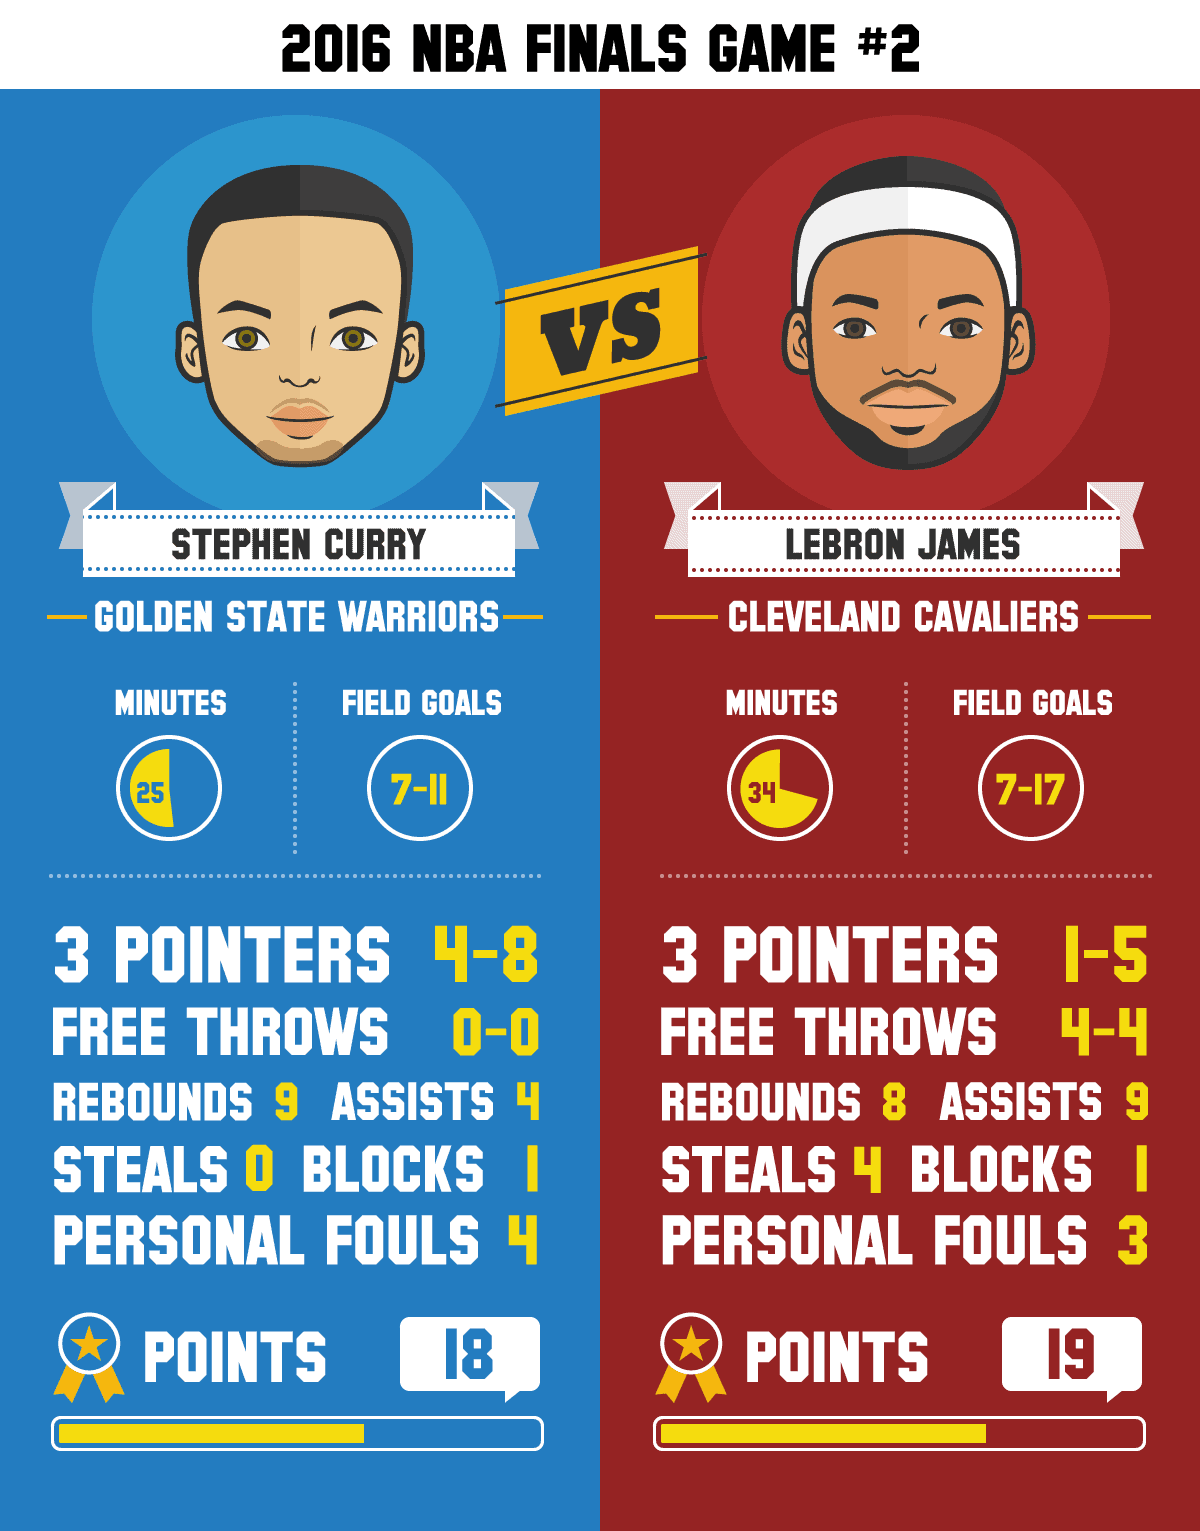 Stephen-vs-Lebron-infographic-final